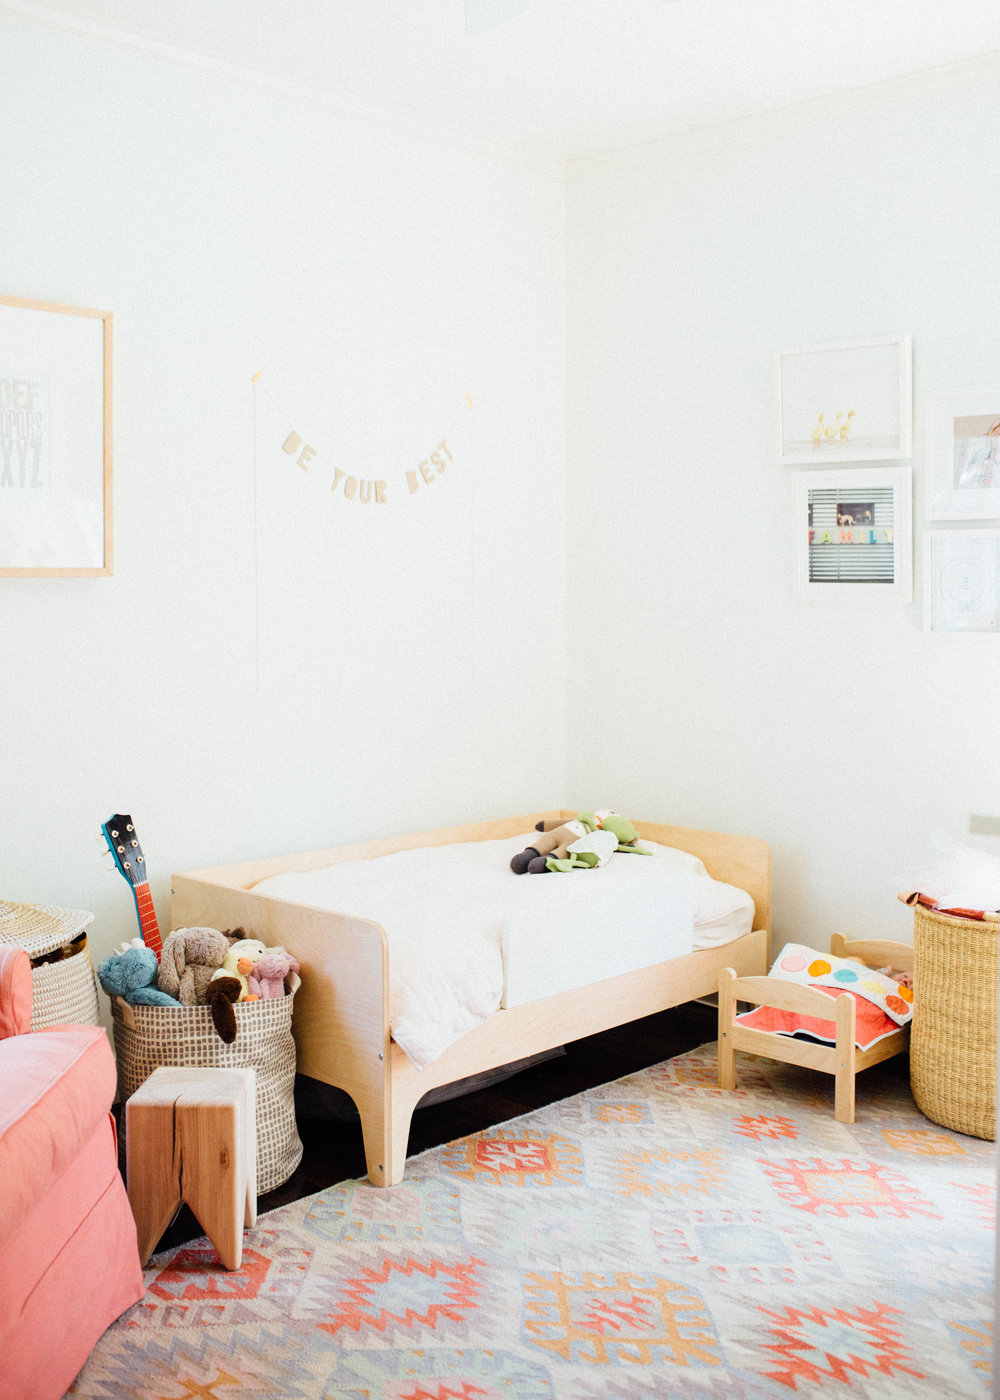 los-angeles-interior-photography_home-tour_venice-california-2.jpg